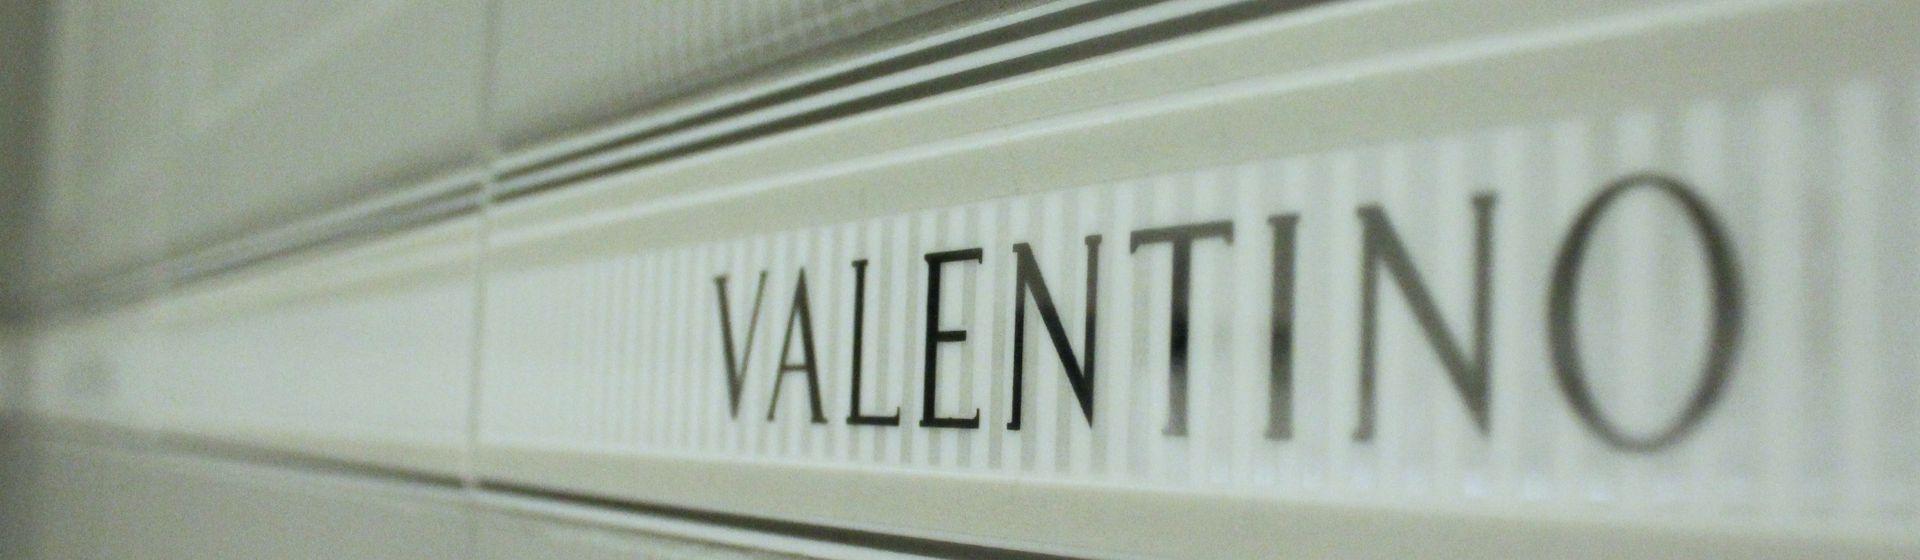 0-koupelna-valentino-final